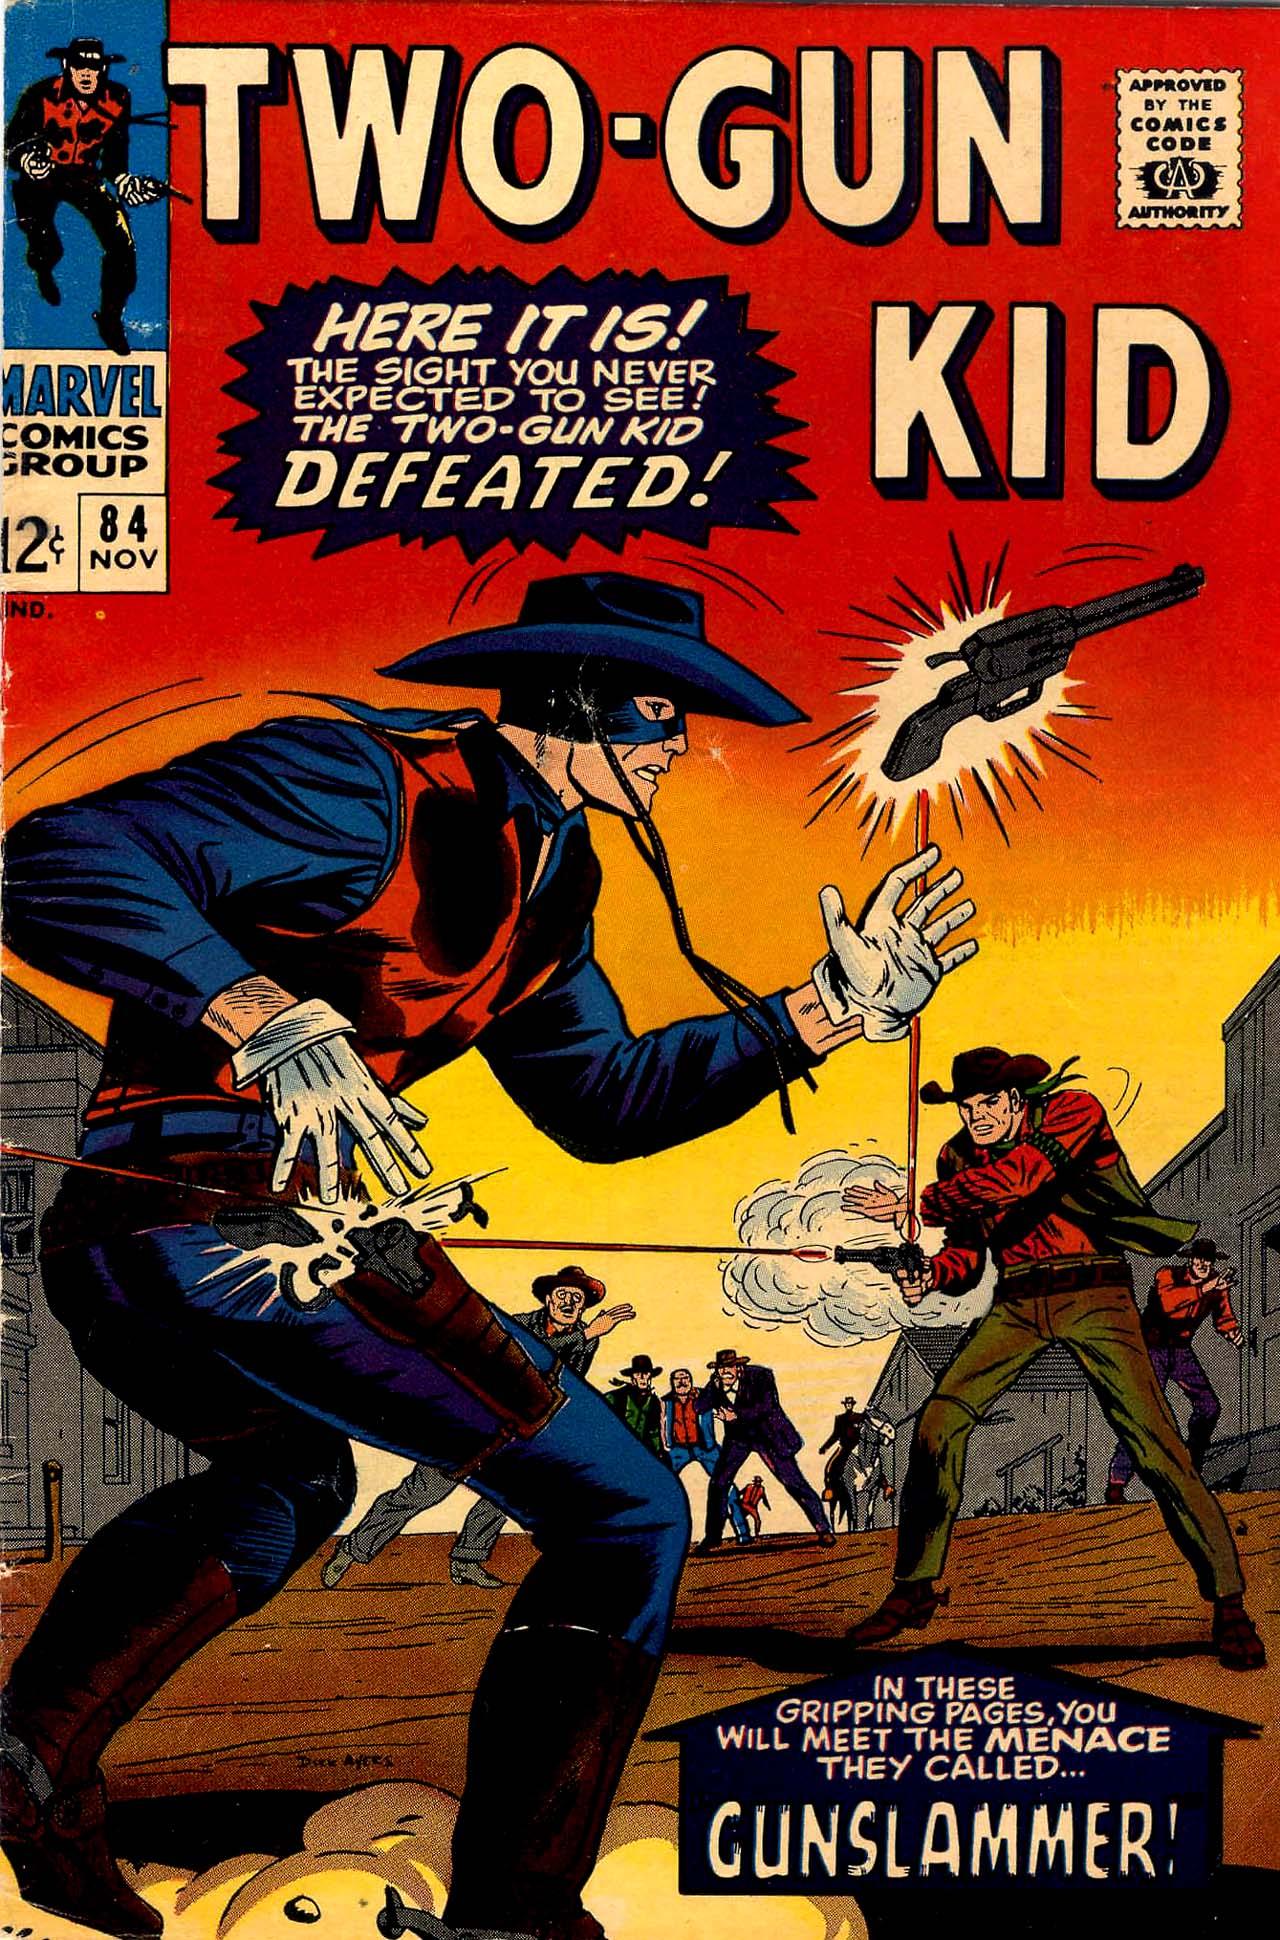 Read online Two-Gun Kid comic -  Issue #84 - 1